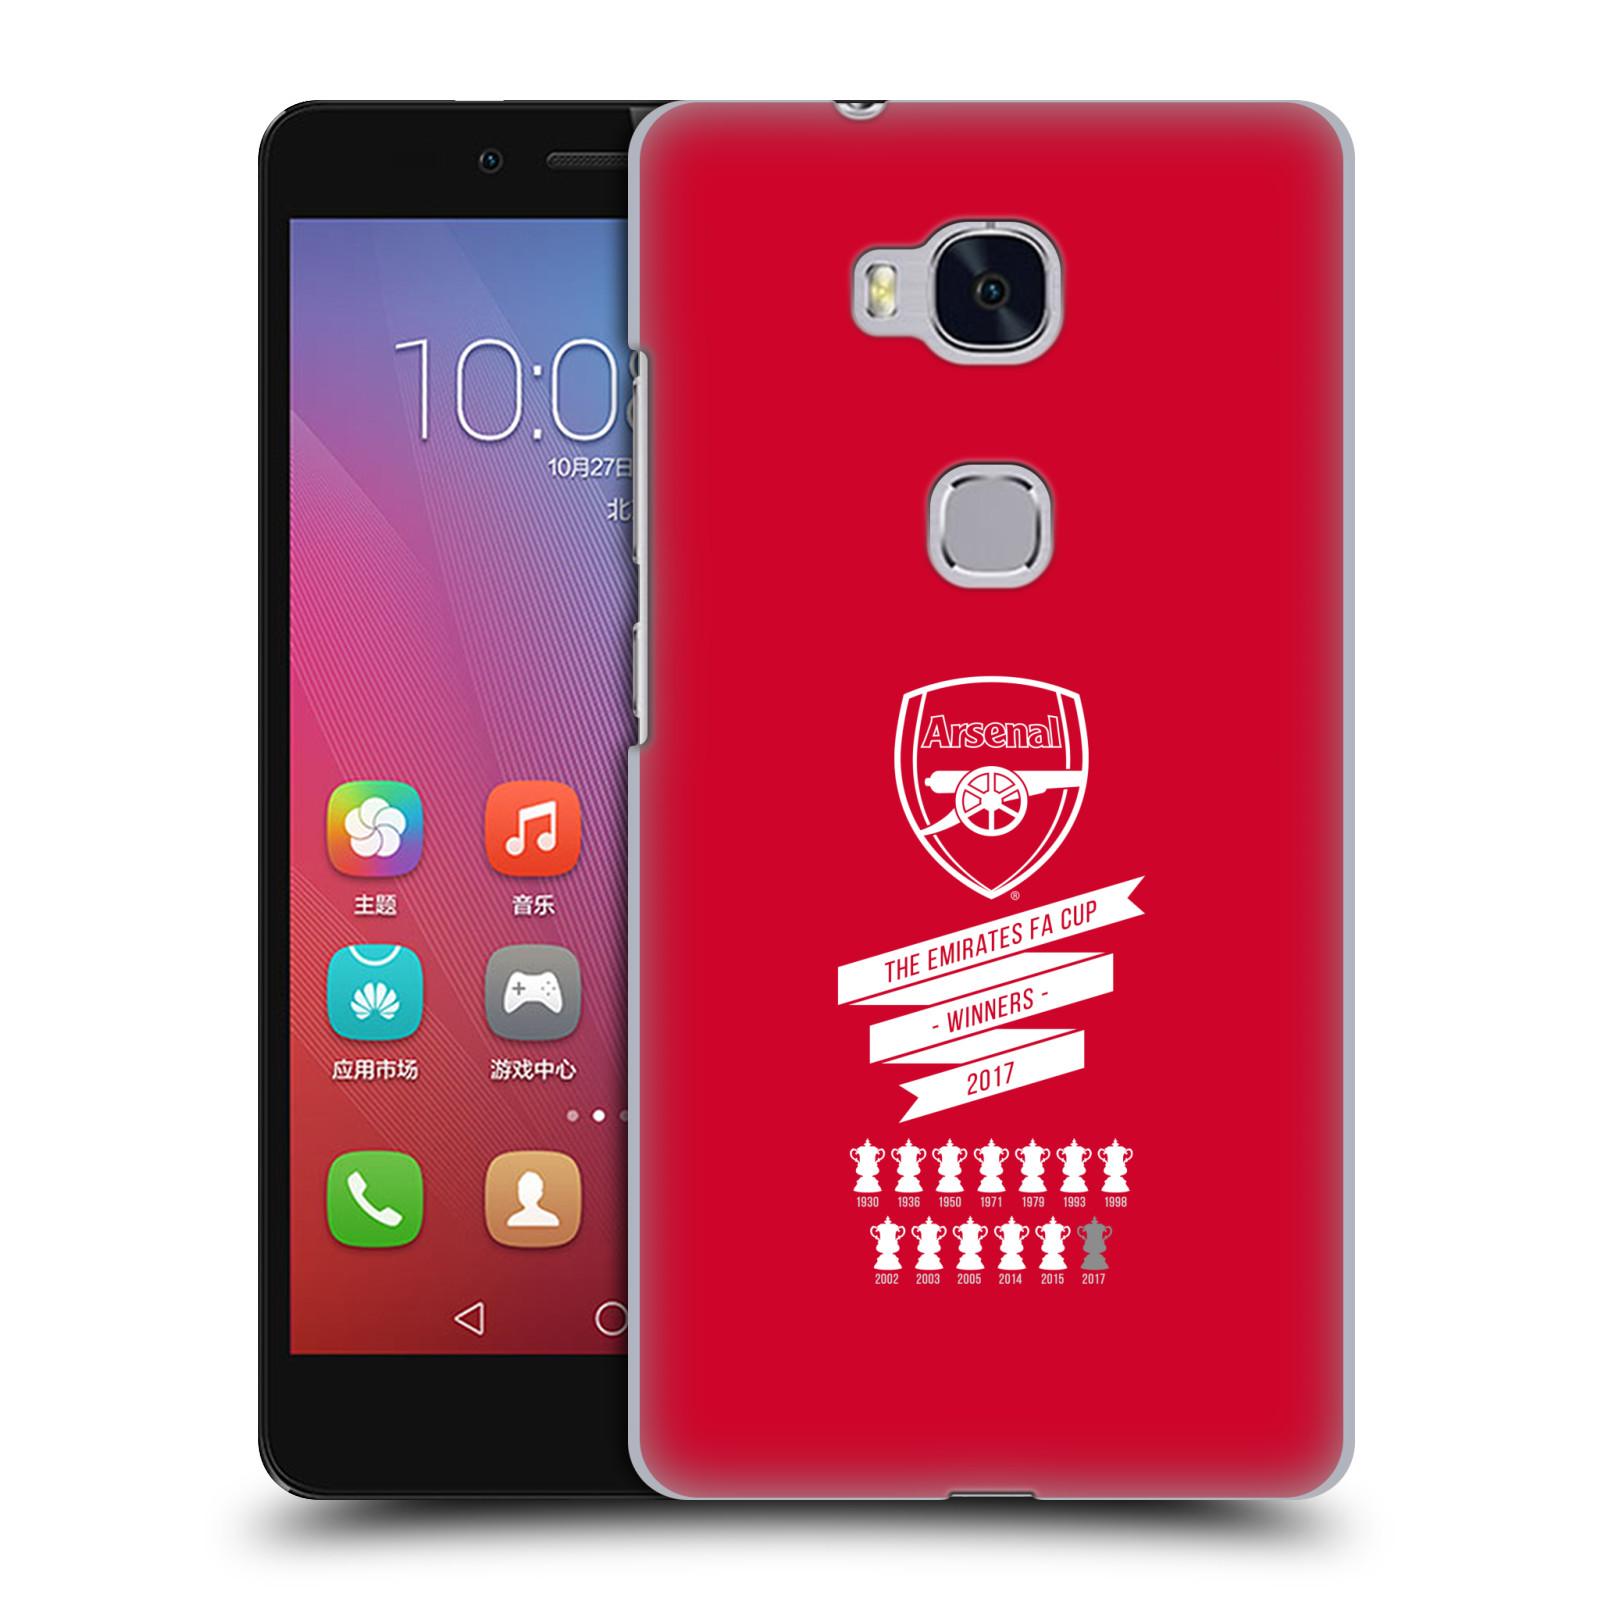 Plastové pouzdro na mobil Honor 5X - Head Case - Arsenal FC - 13 Wins